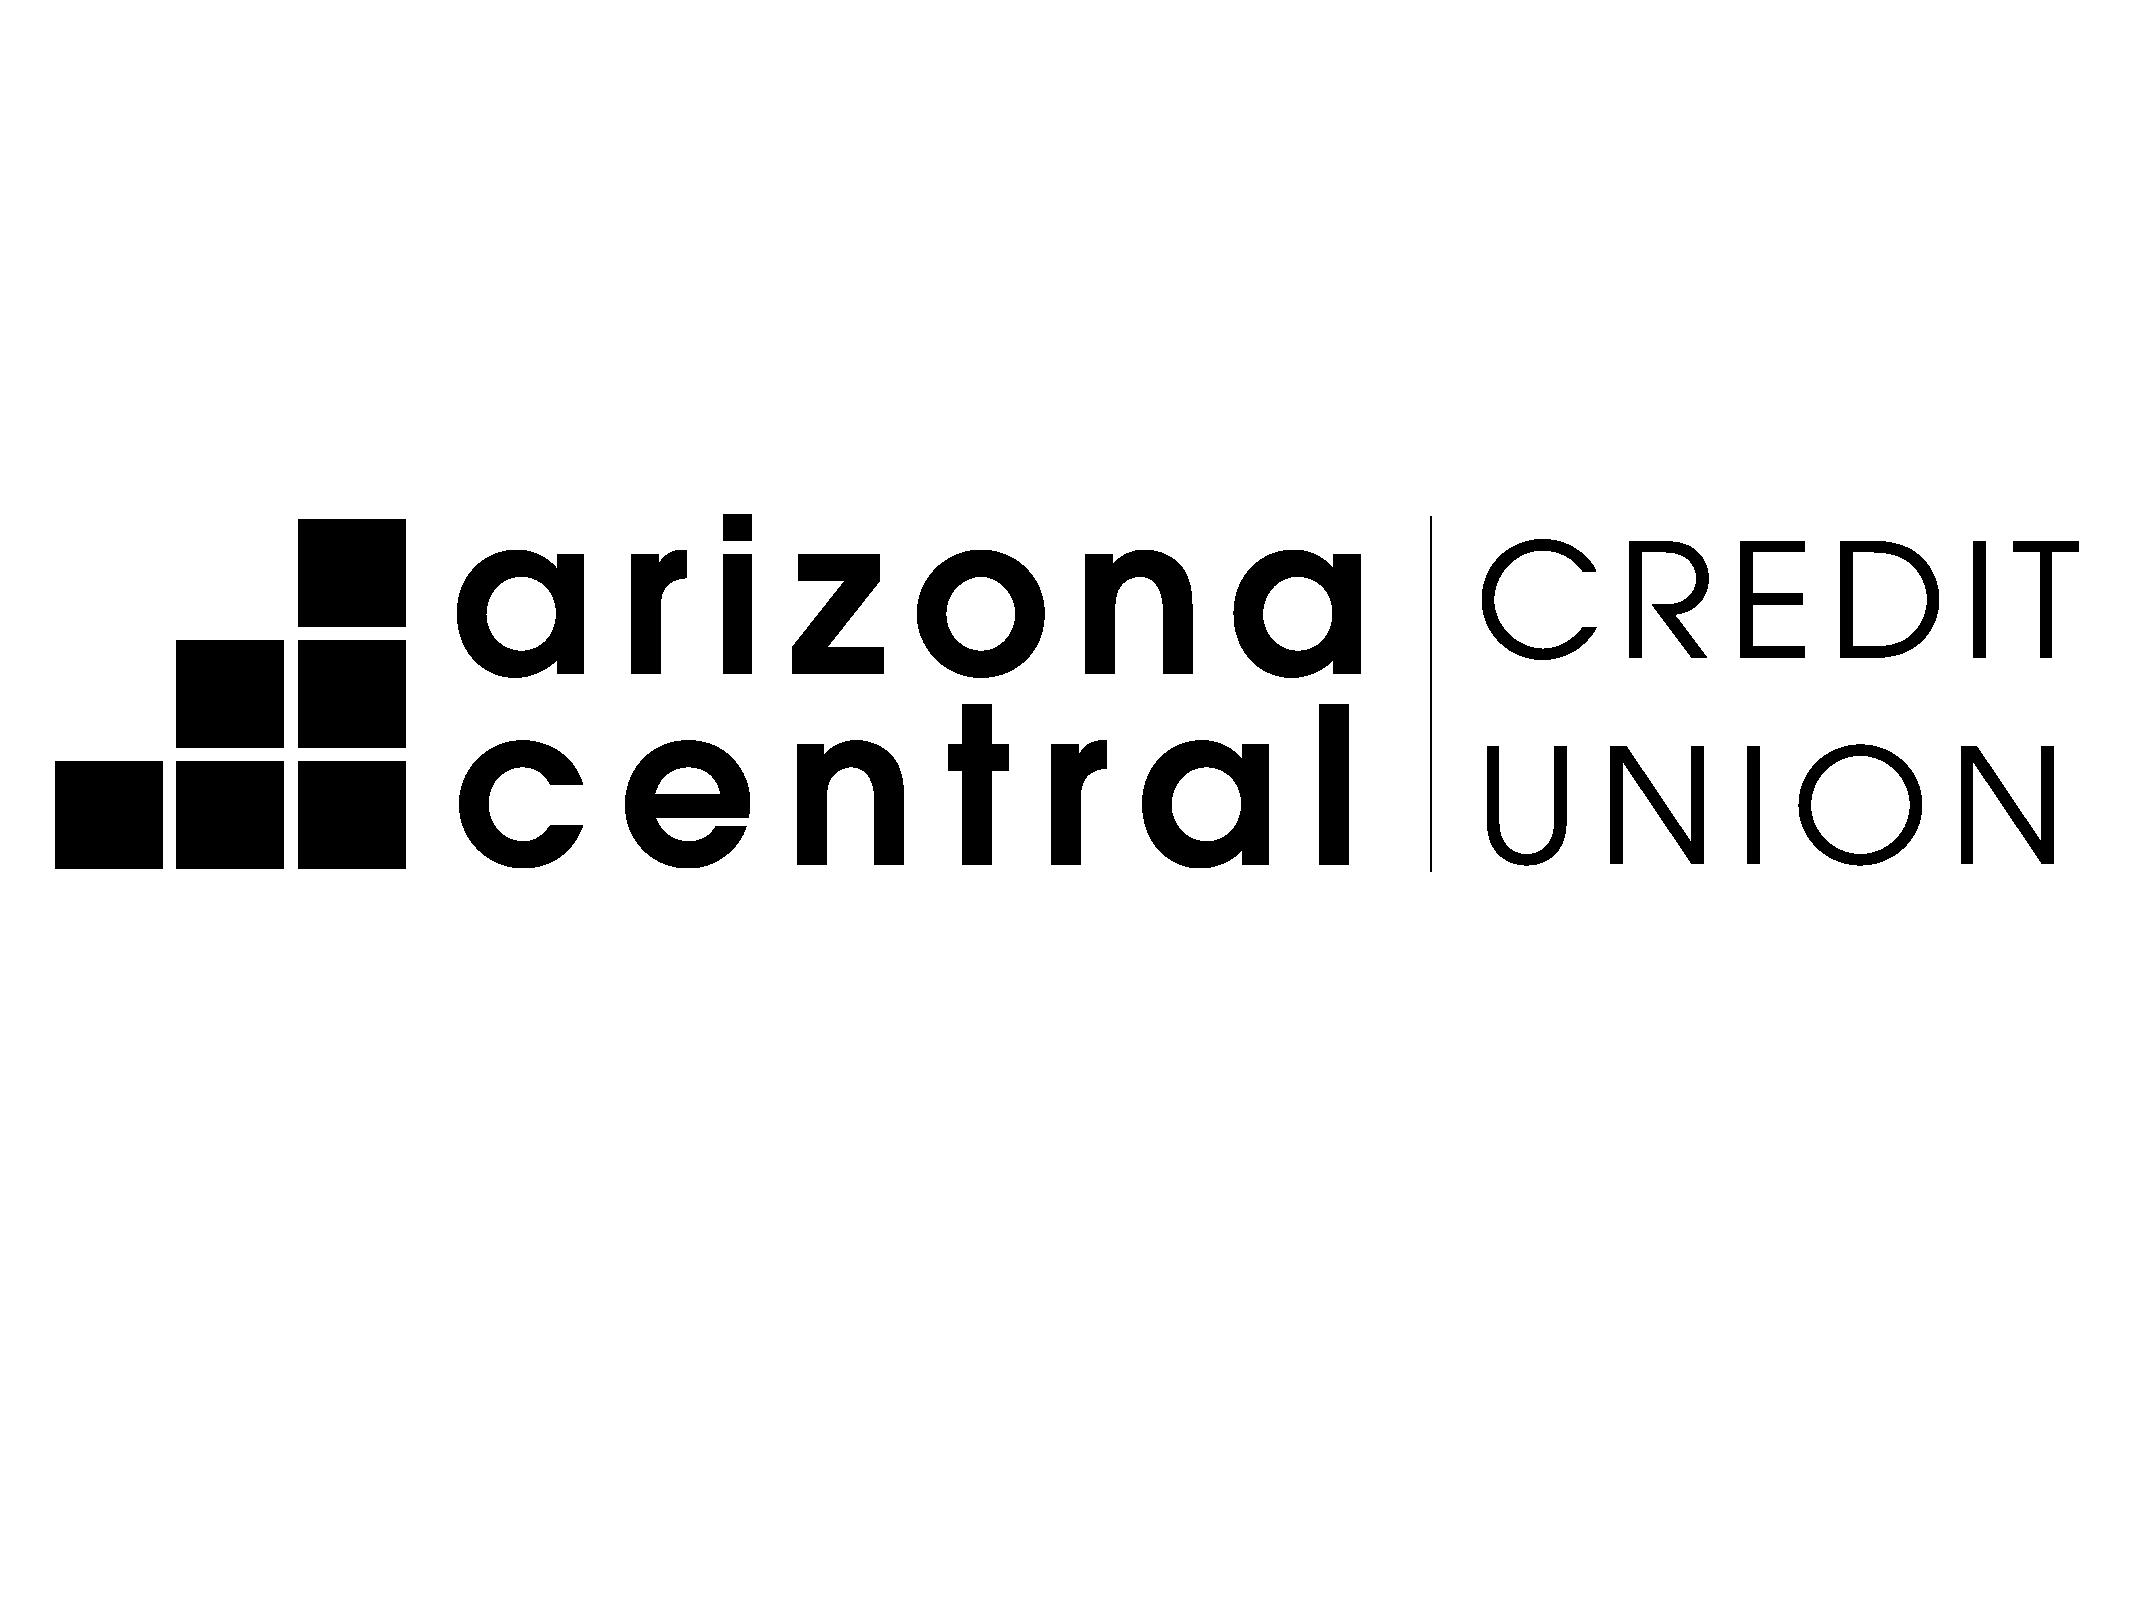 Arizona Central Credit Union Logo photo - 1